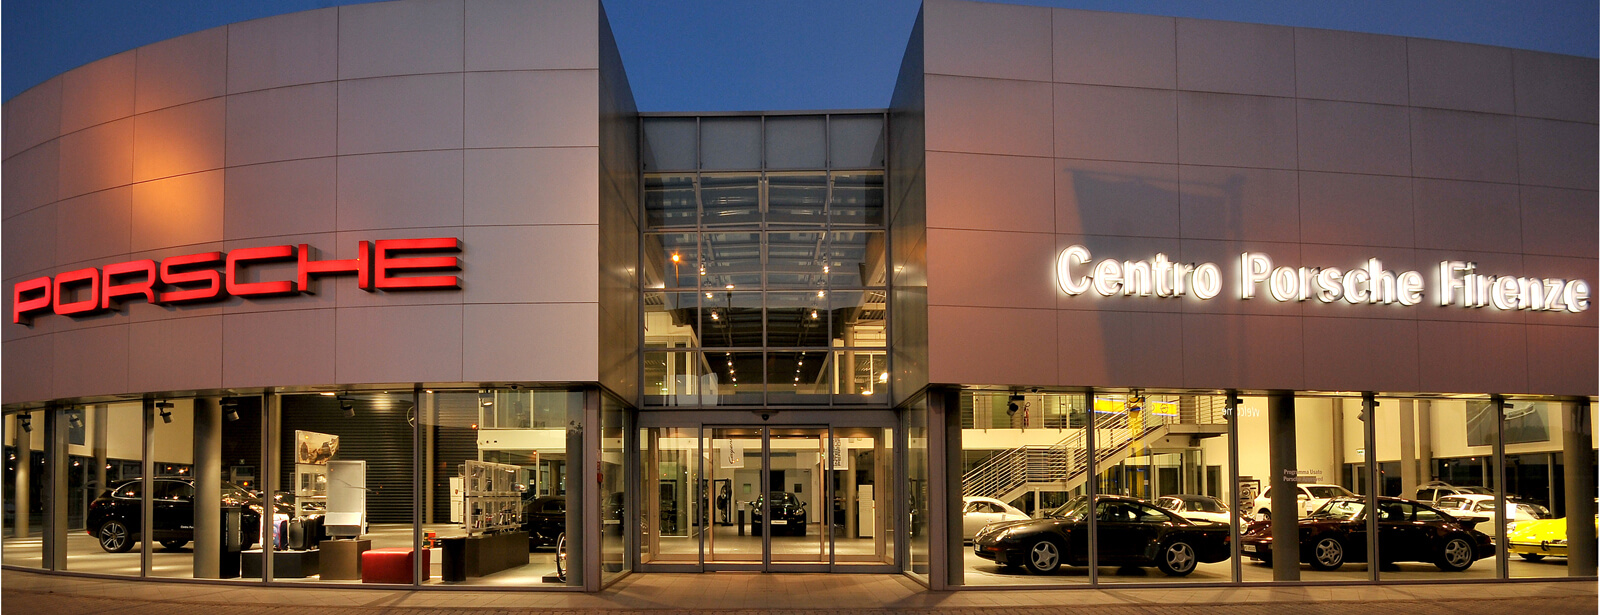 Centro Porsche Firenze